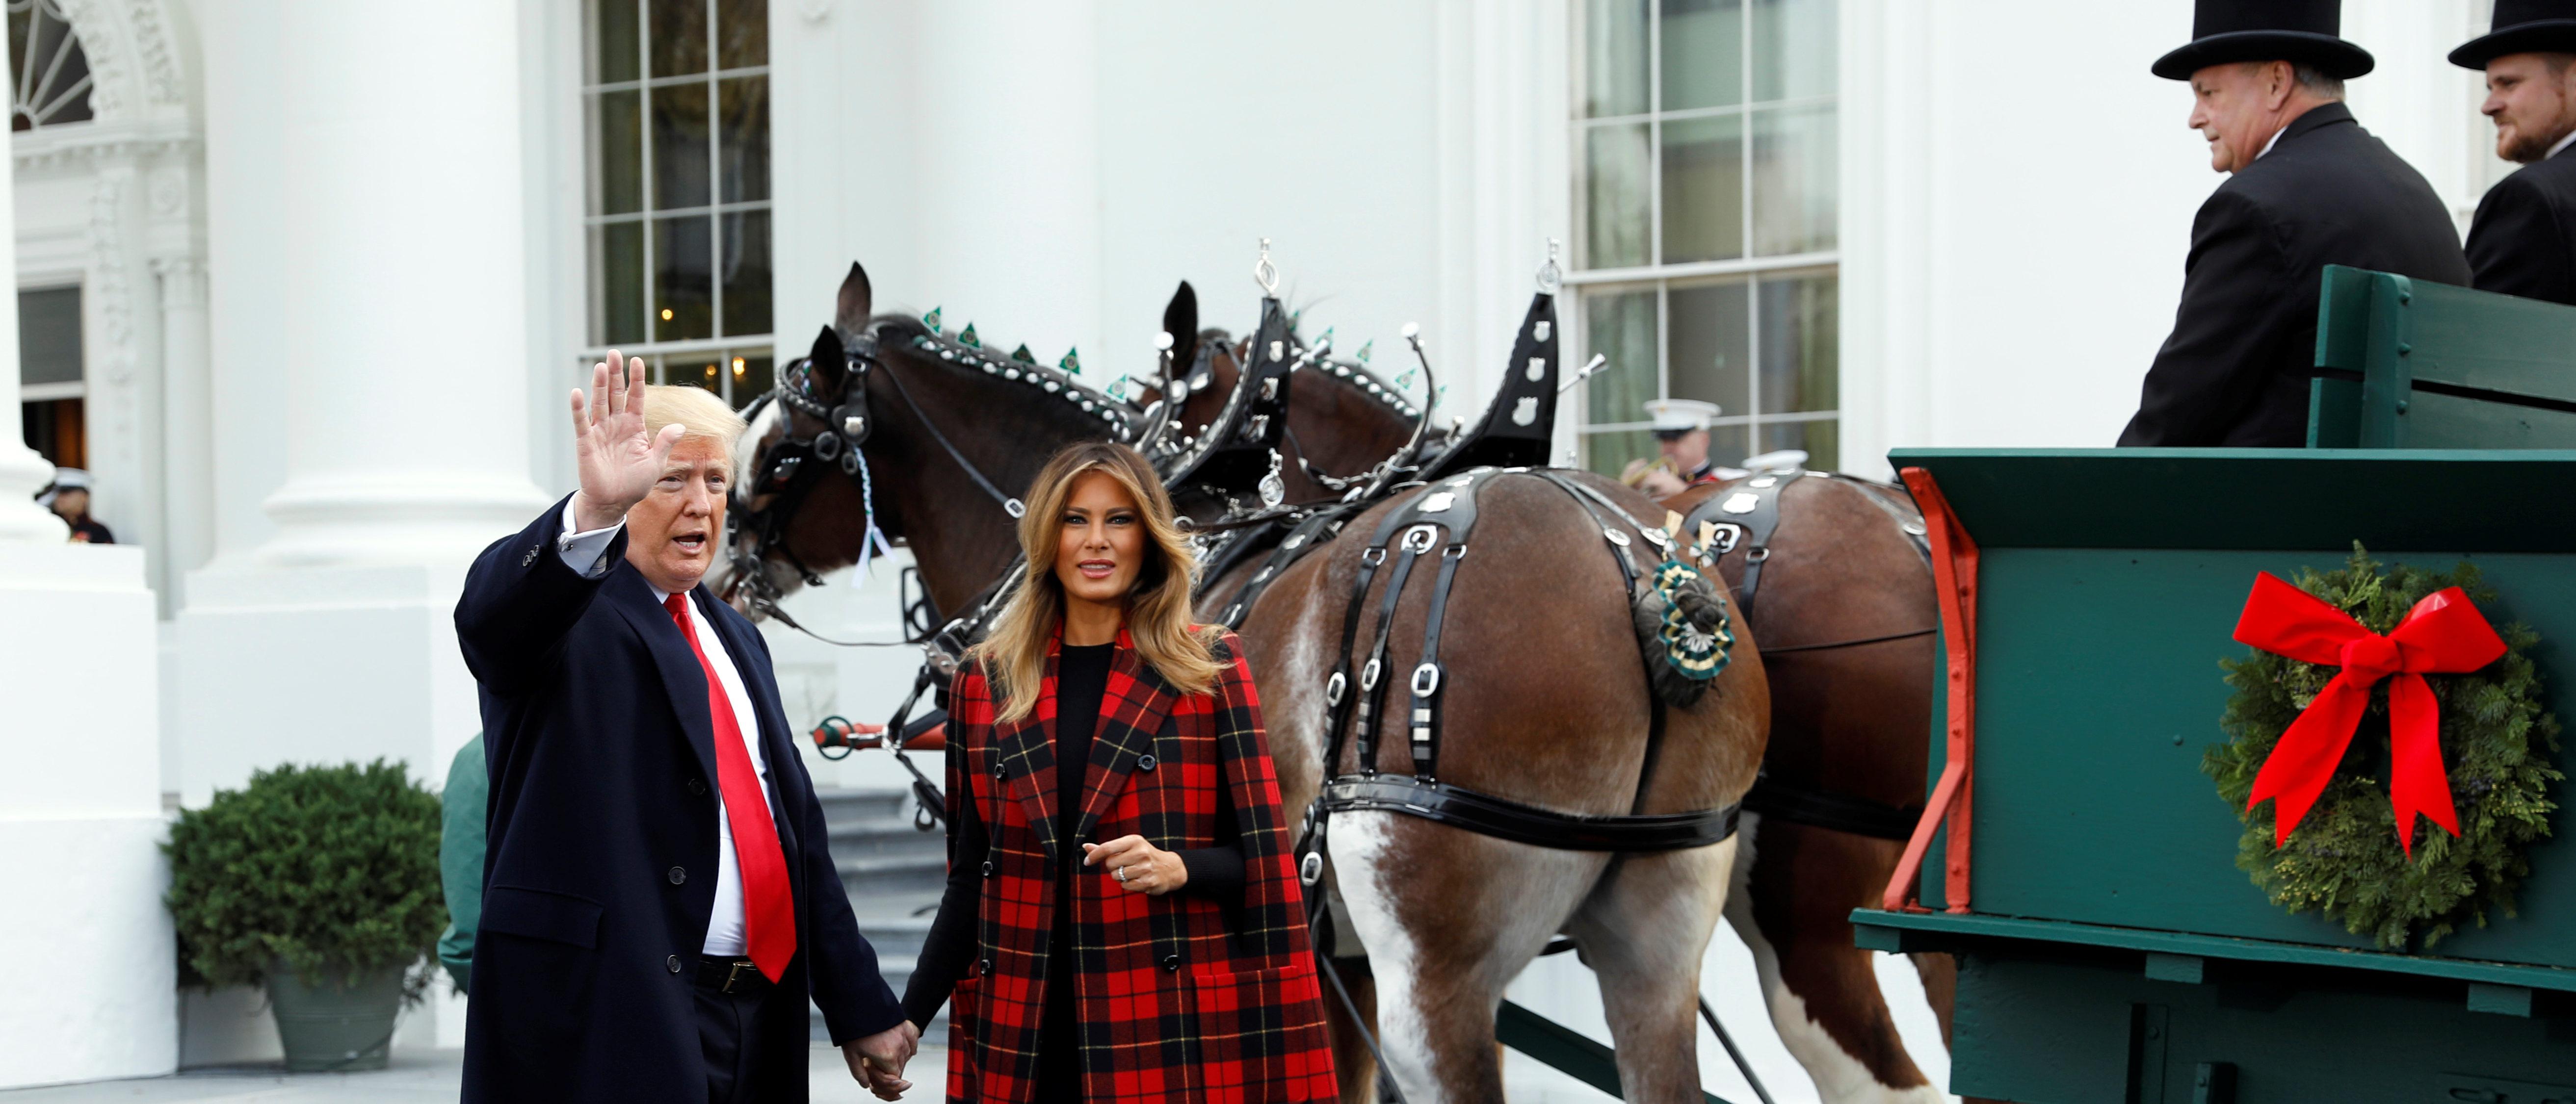 Melania Christmas Decorations.Melania Trump Shares Sneak Peek Of White House Christmas